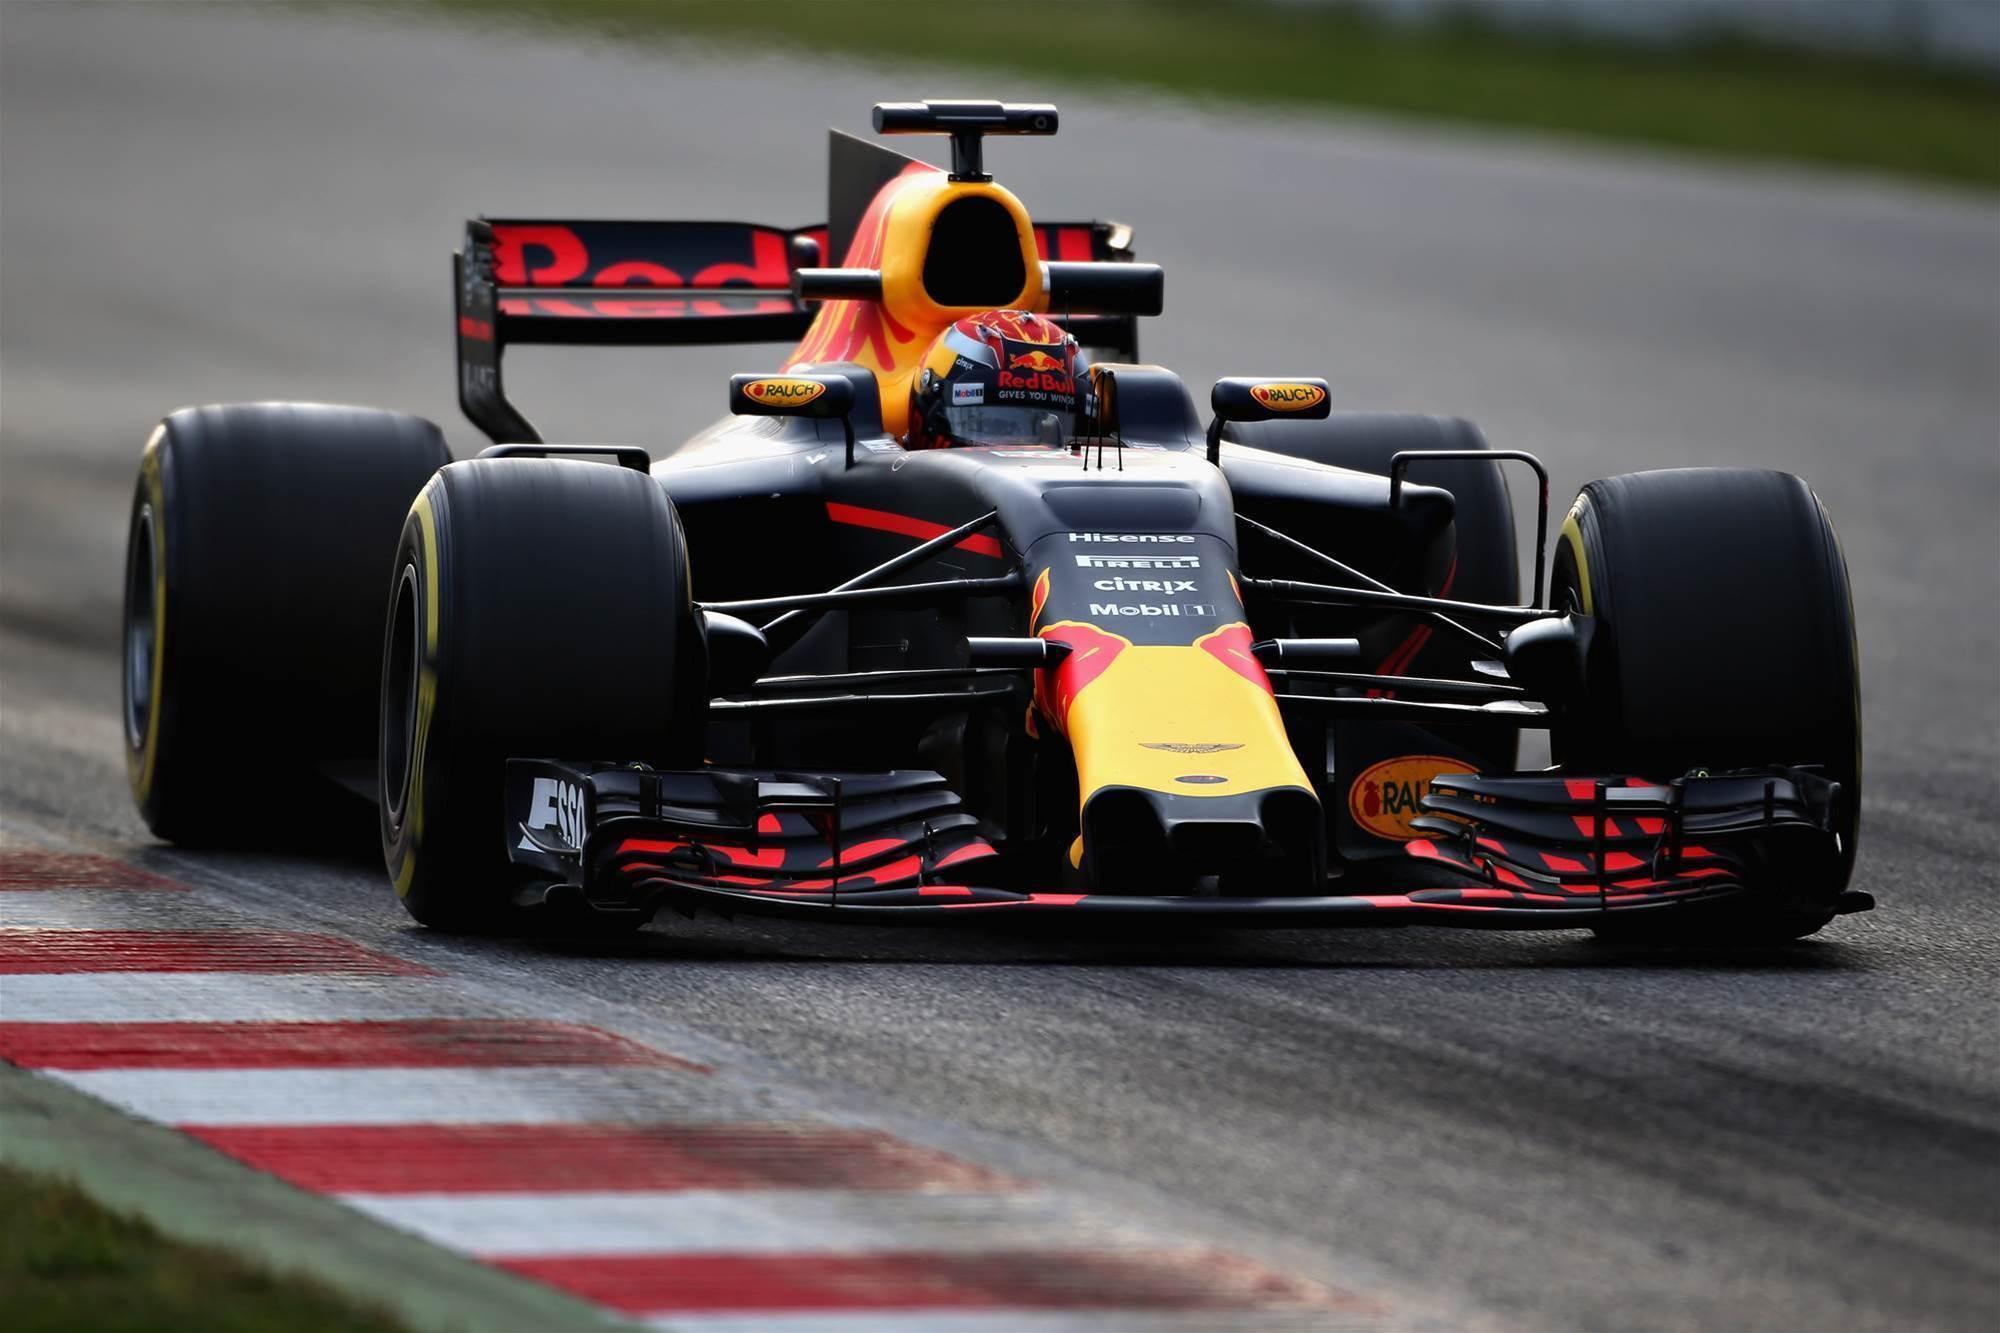 Pic gallery: Formula 1 pre-season testing